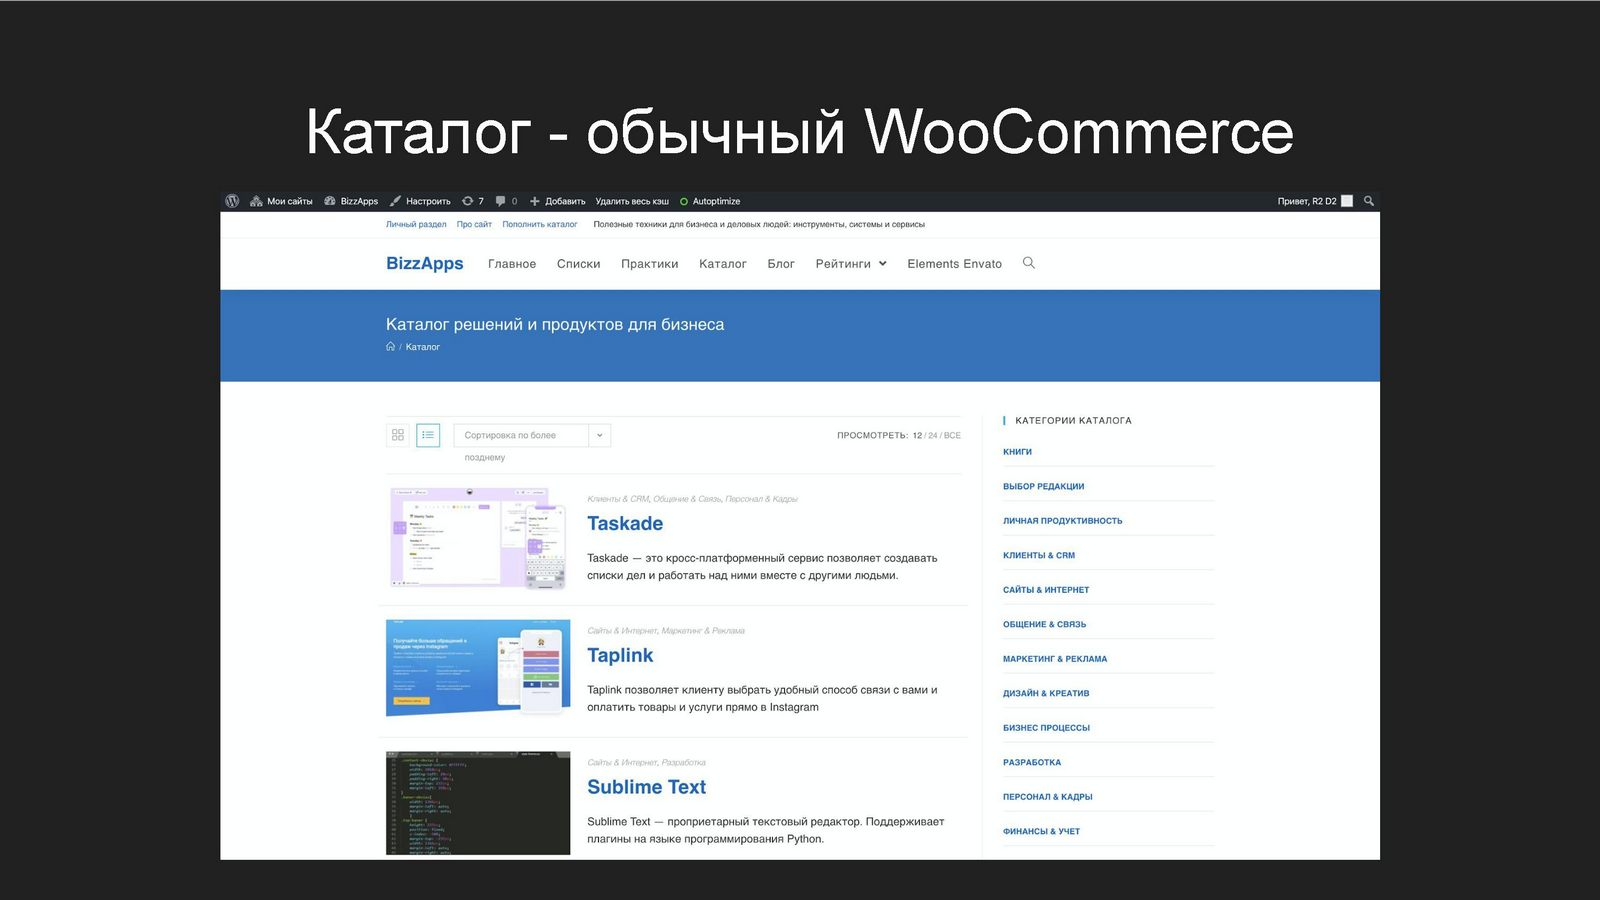 wp10-Анатолий Юмашев-Агрегатор bizzapps.ru 13